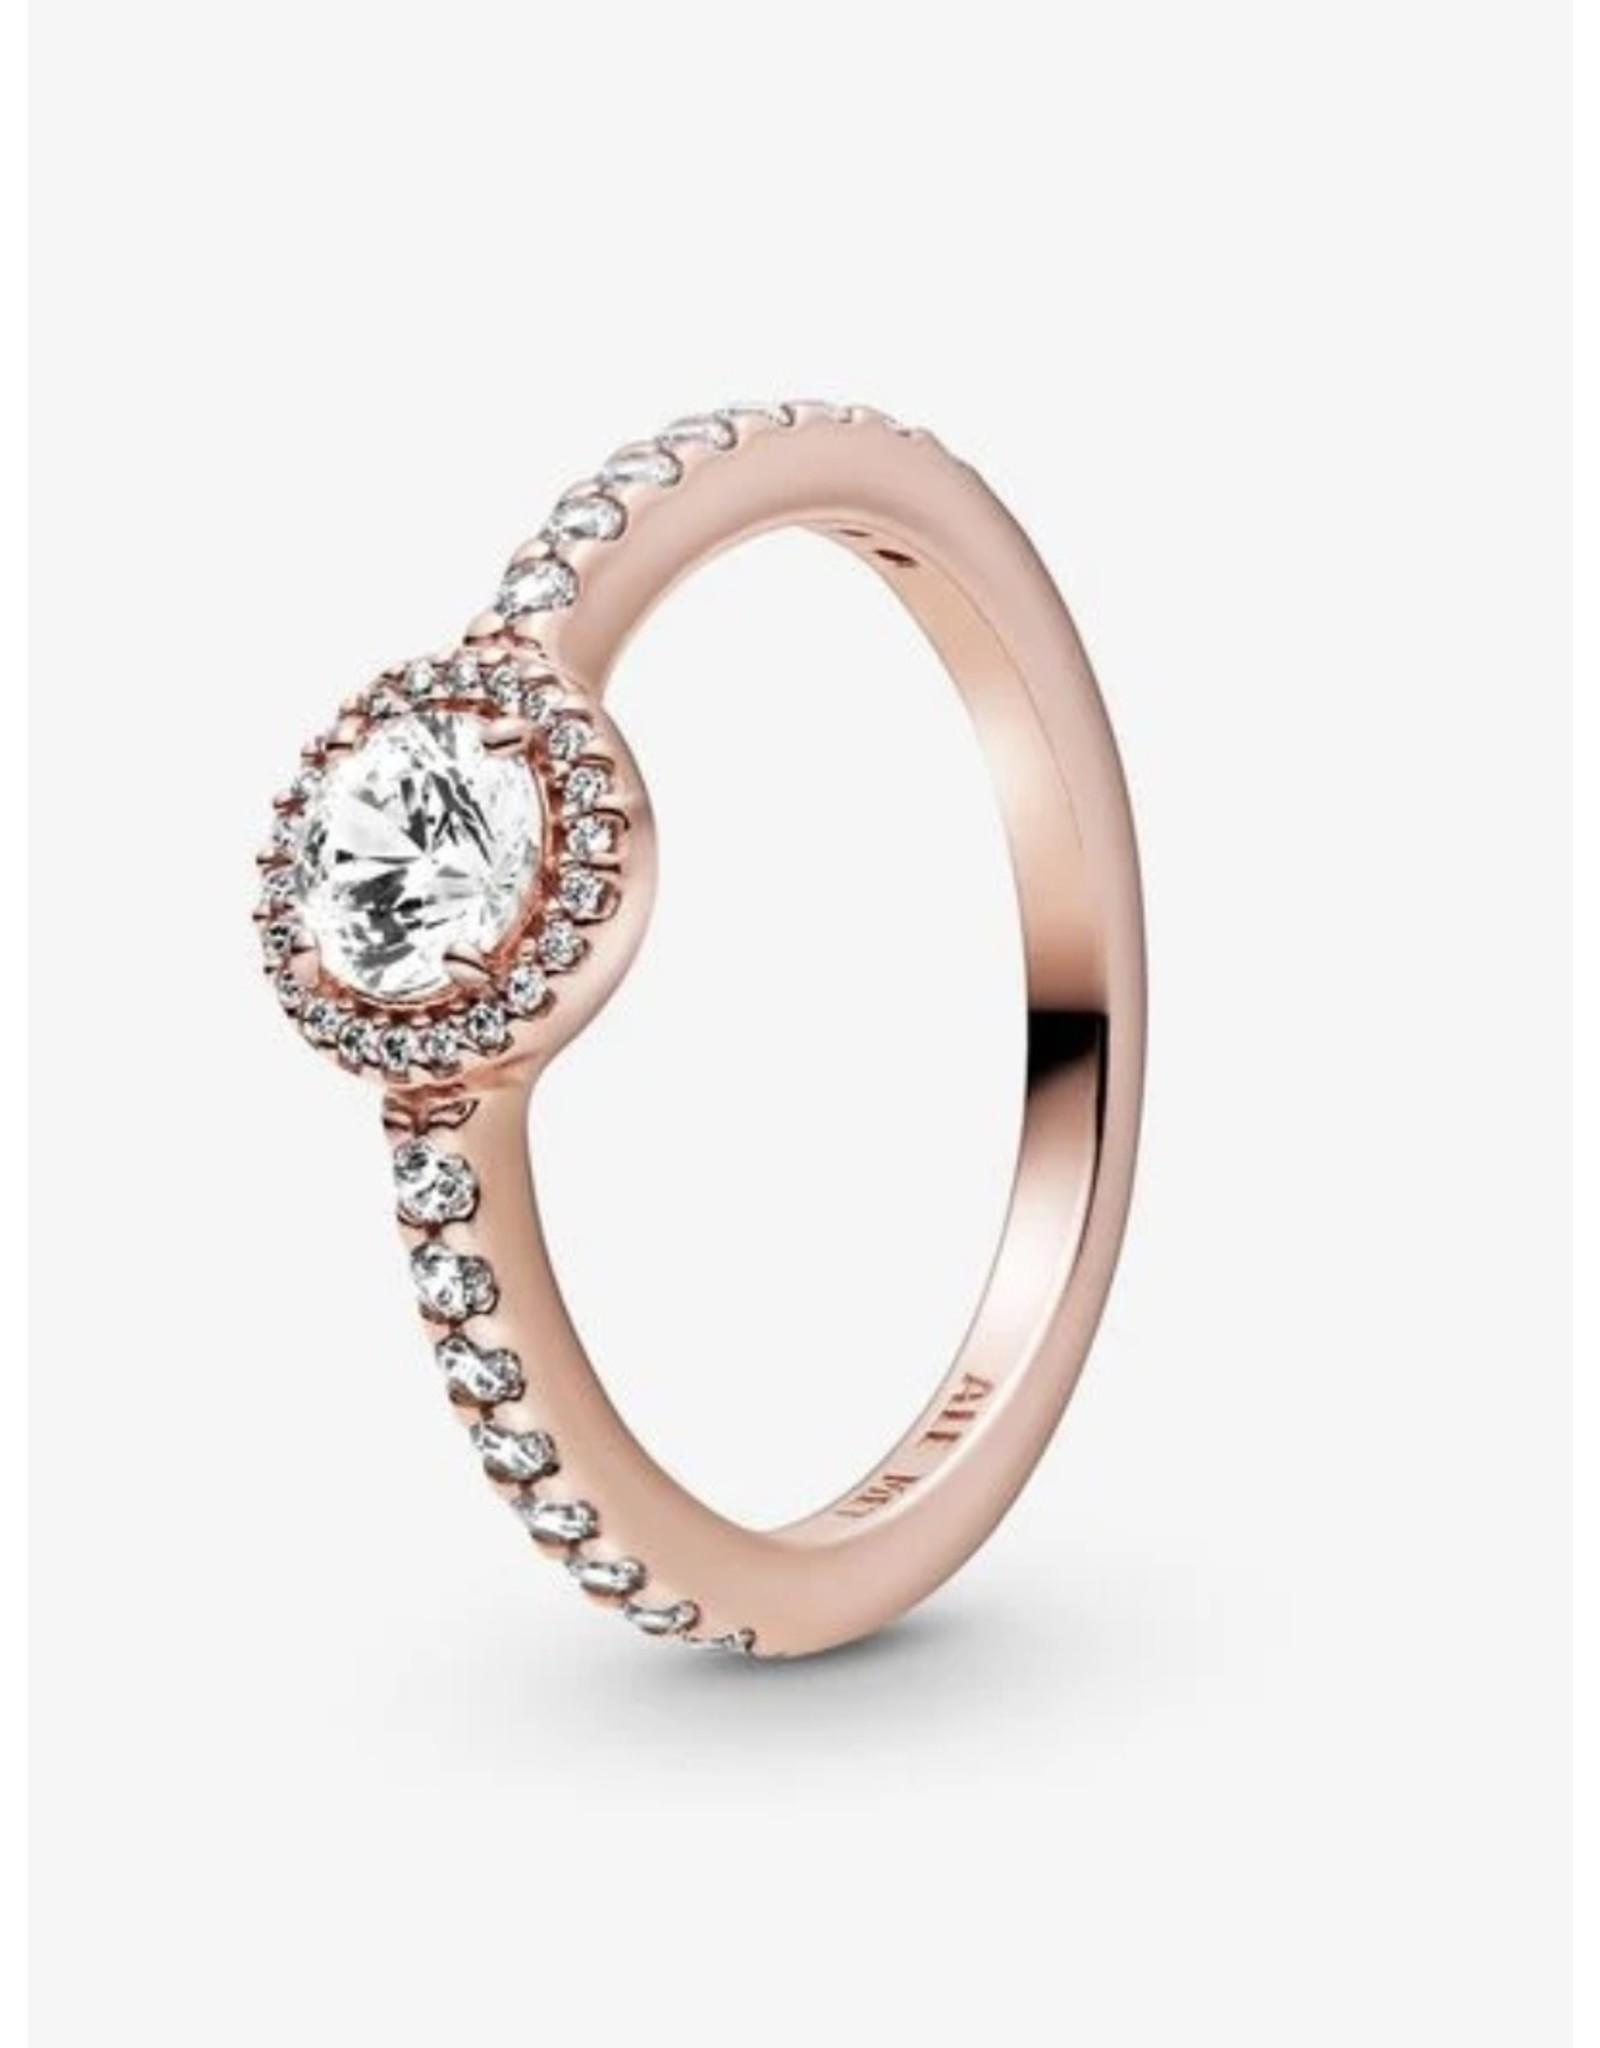 Pandora Pandora Ring,(180946CZ)  Rose Gold, Classic Elegance Clear CZ